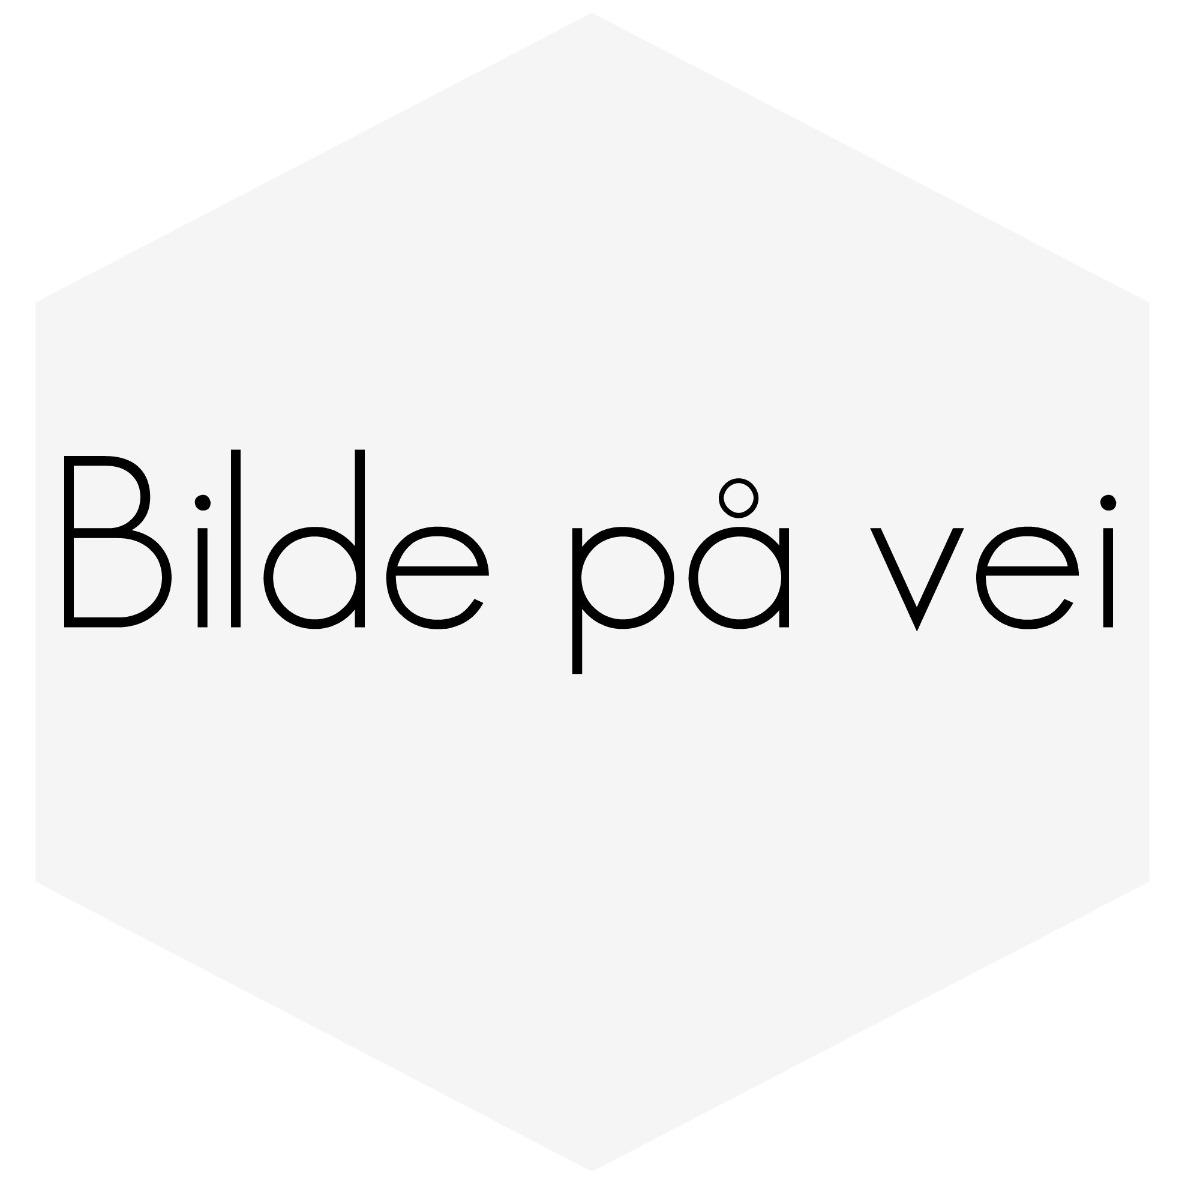 BREMSESKIVE BAK VOLVO S/V60 10>S80-06>,XC/V70 08- org volvo